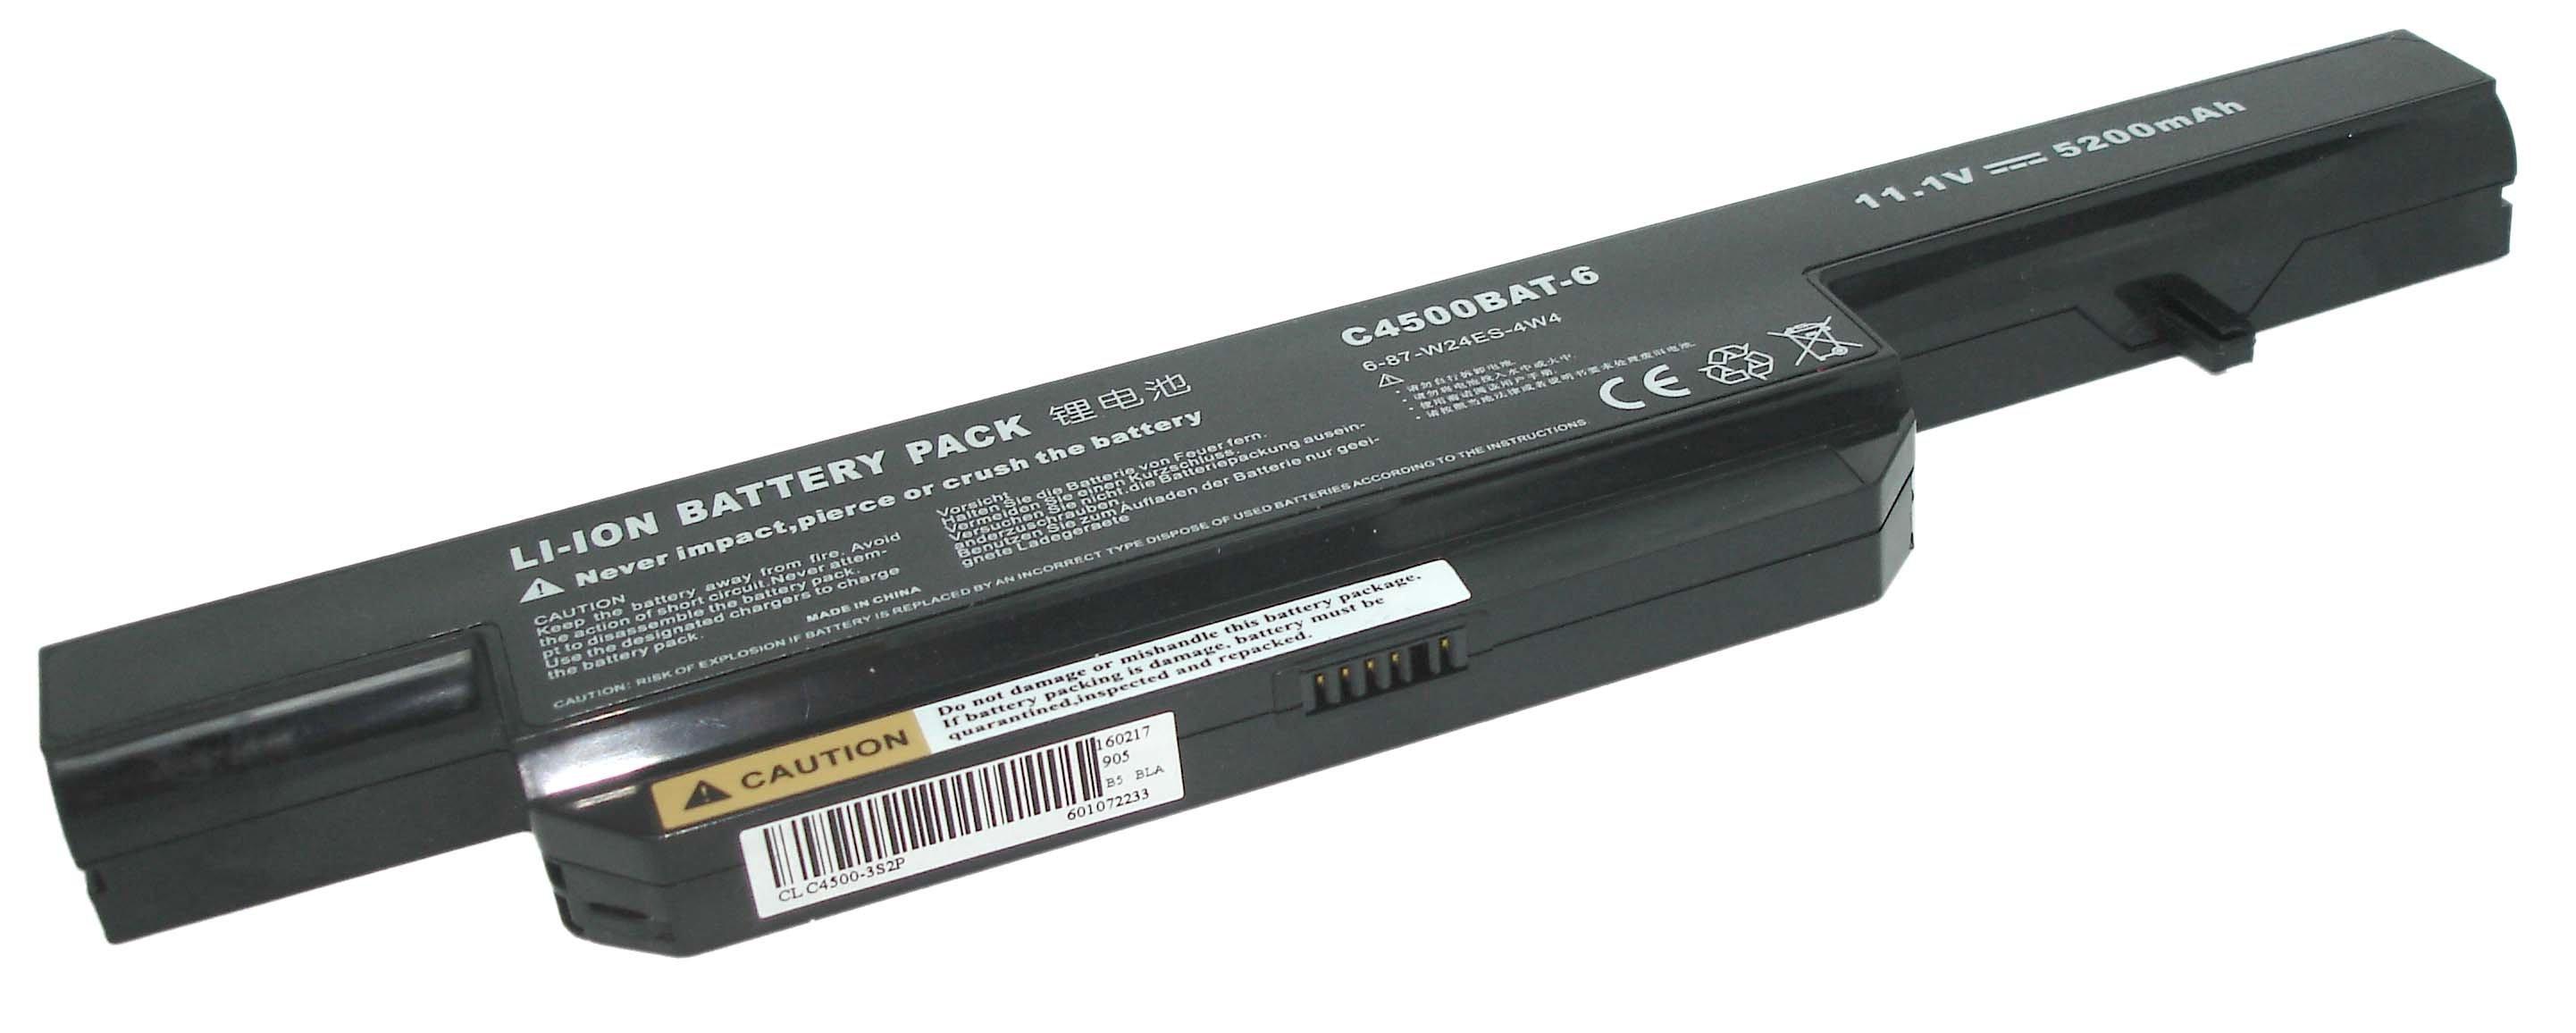 Аккумуляторная батарея C4500BAT6 для ноутбука DNS 0162456 Clevo C4500 4400mah